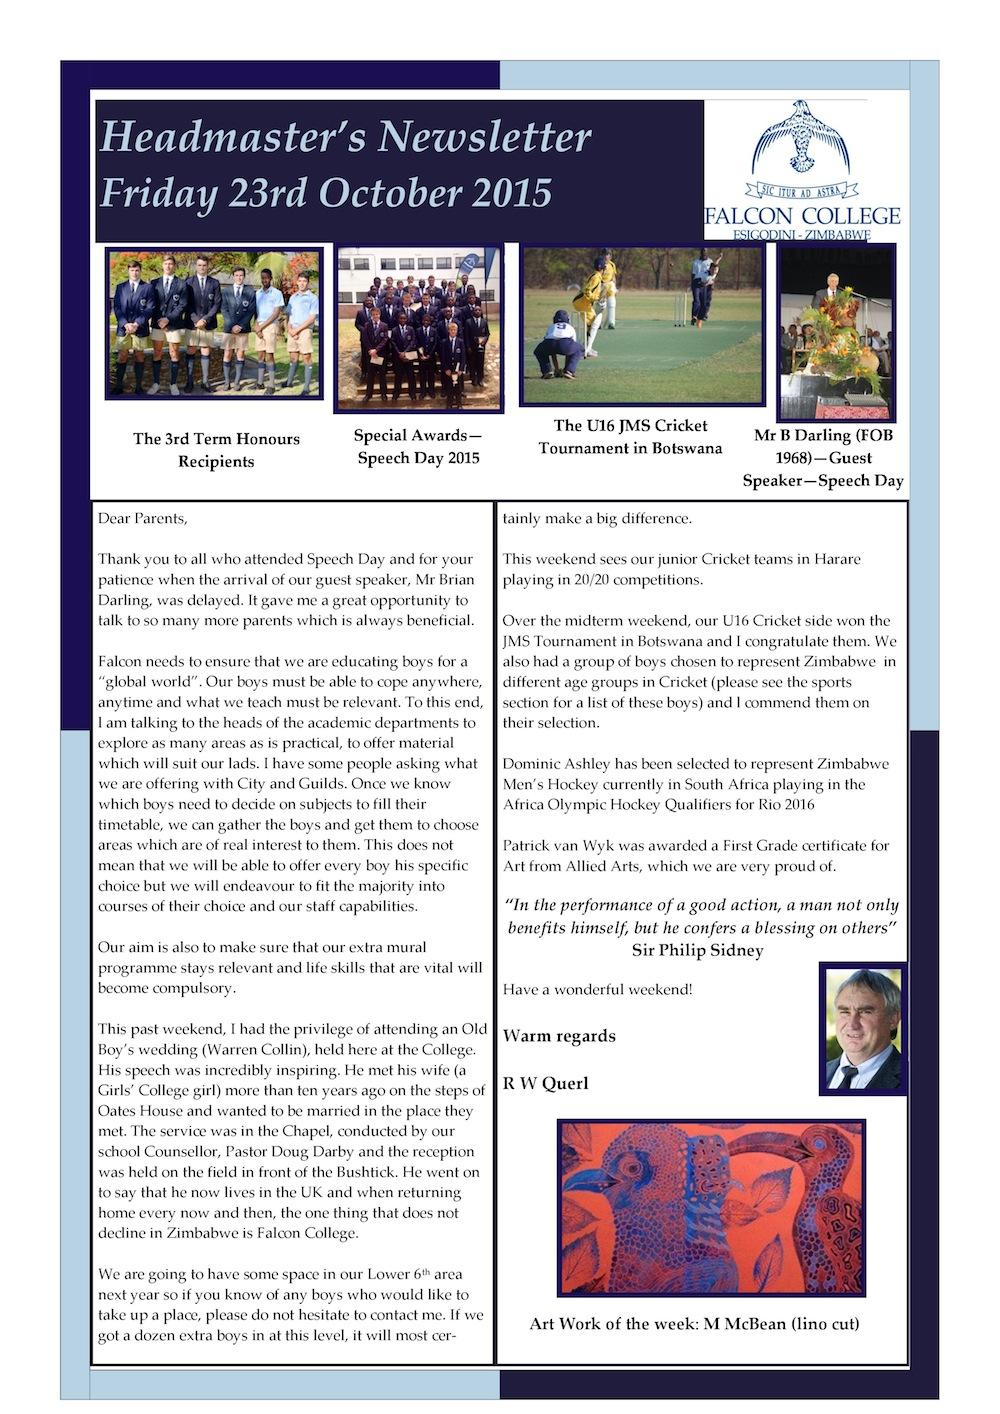 Headmaster's Newsletter Friday 23rd October 2015 edited-page-0